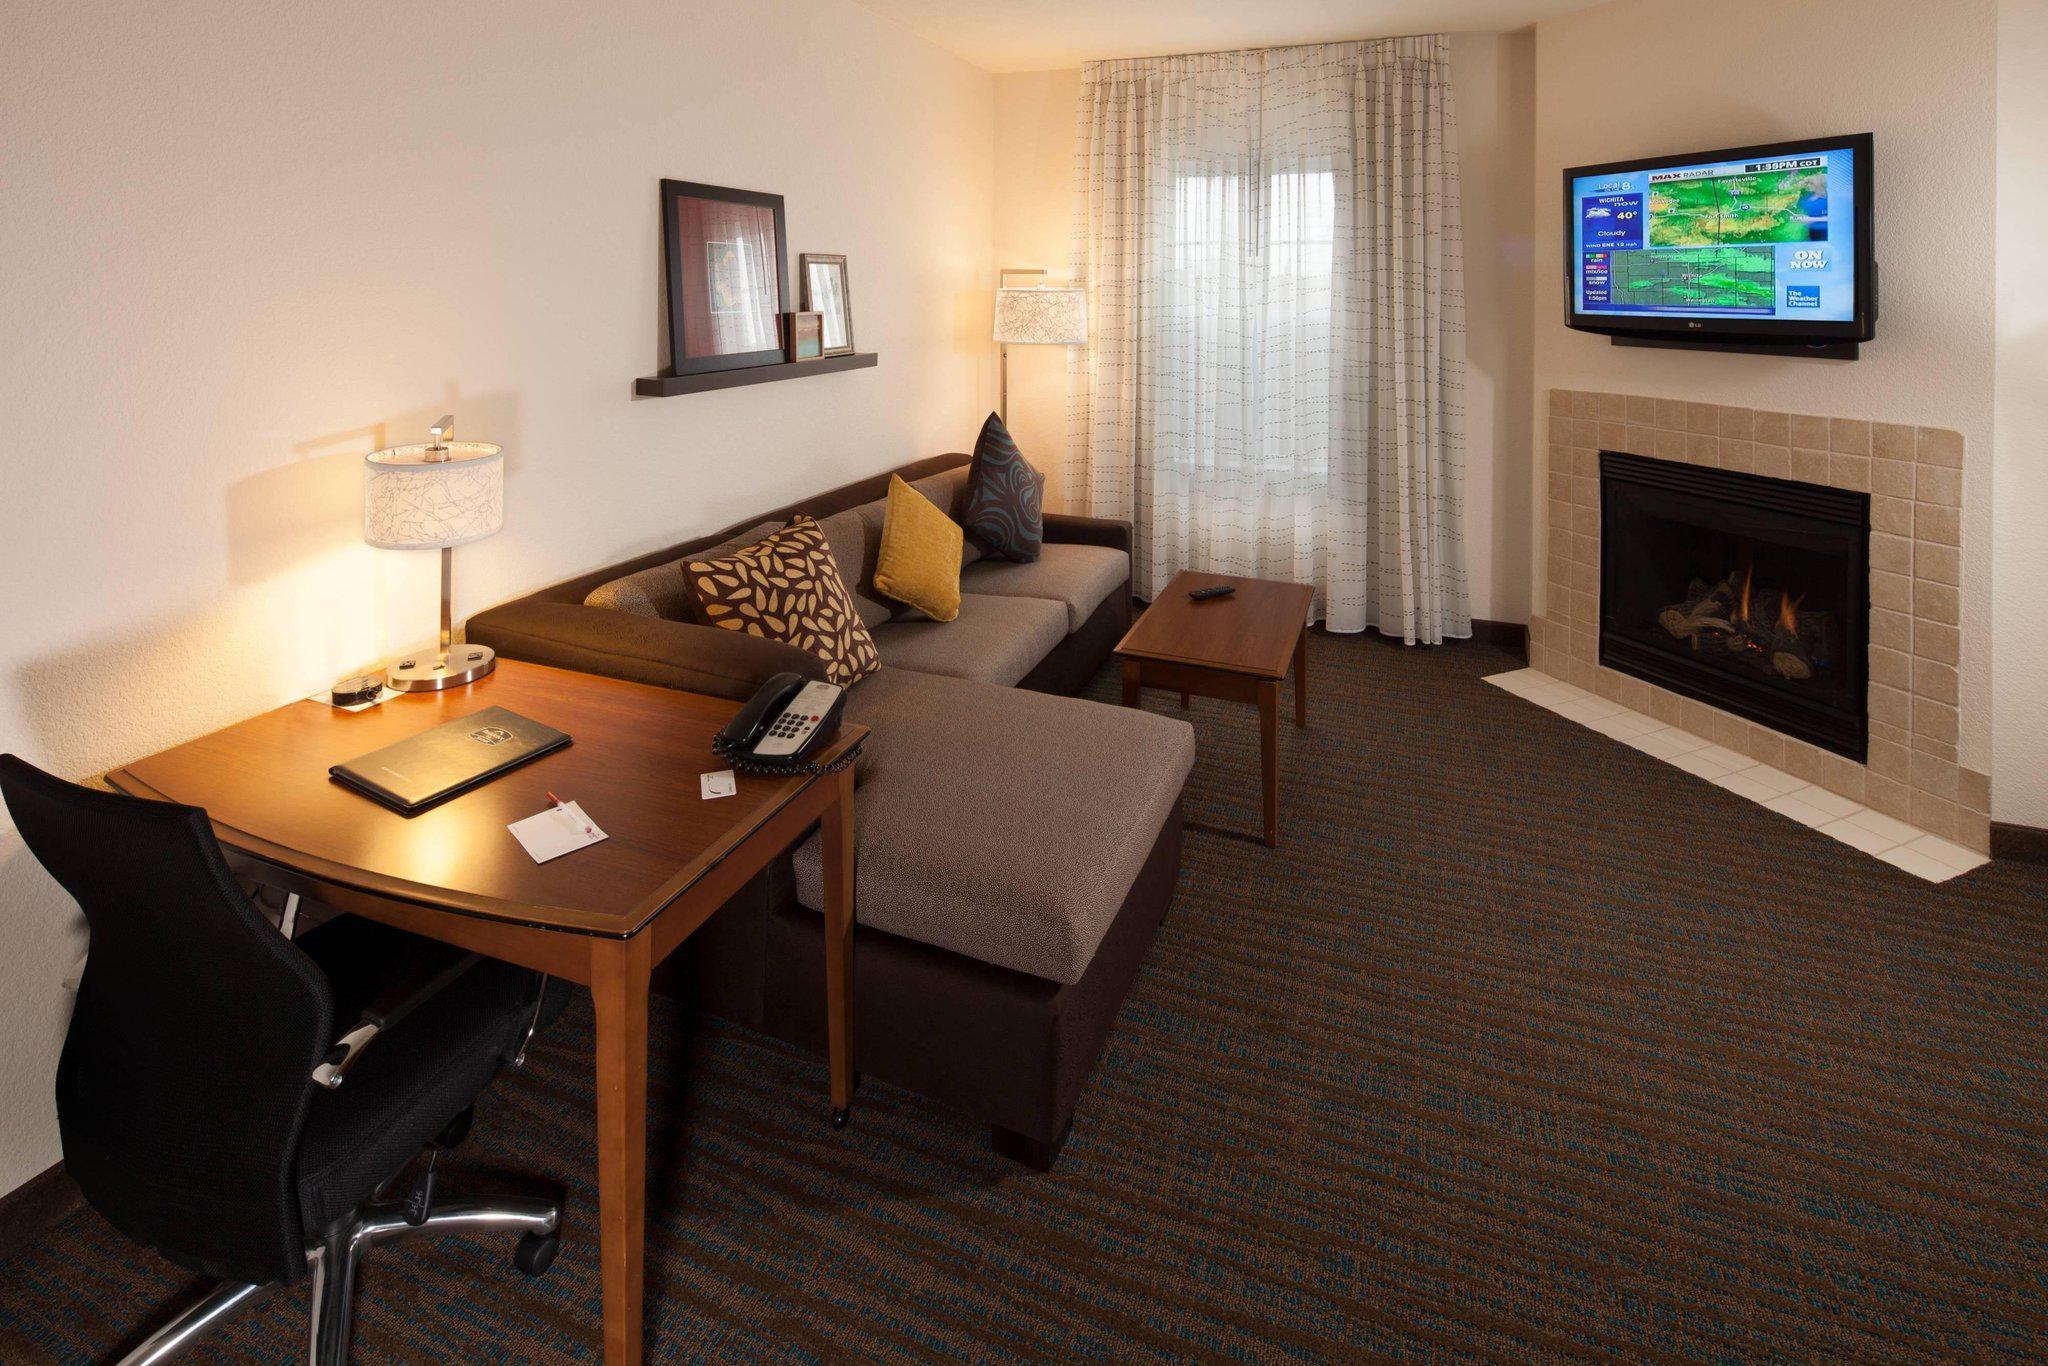 Residence Inn by Marriott Wichita East at Plazzio